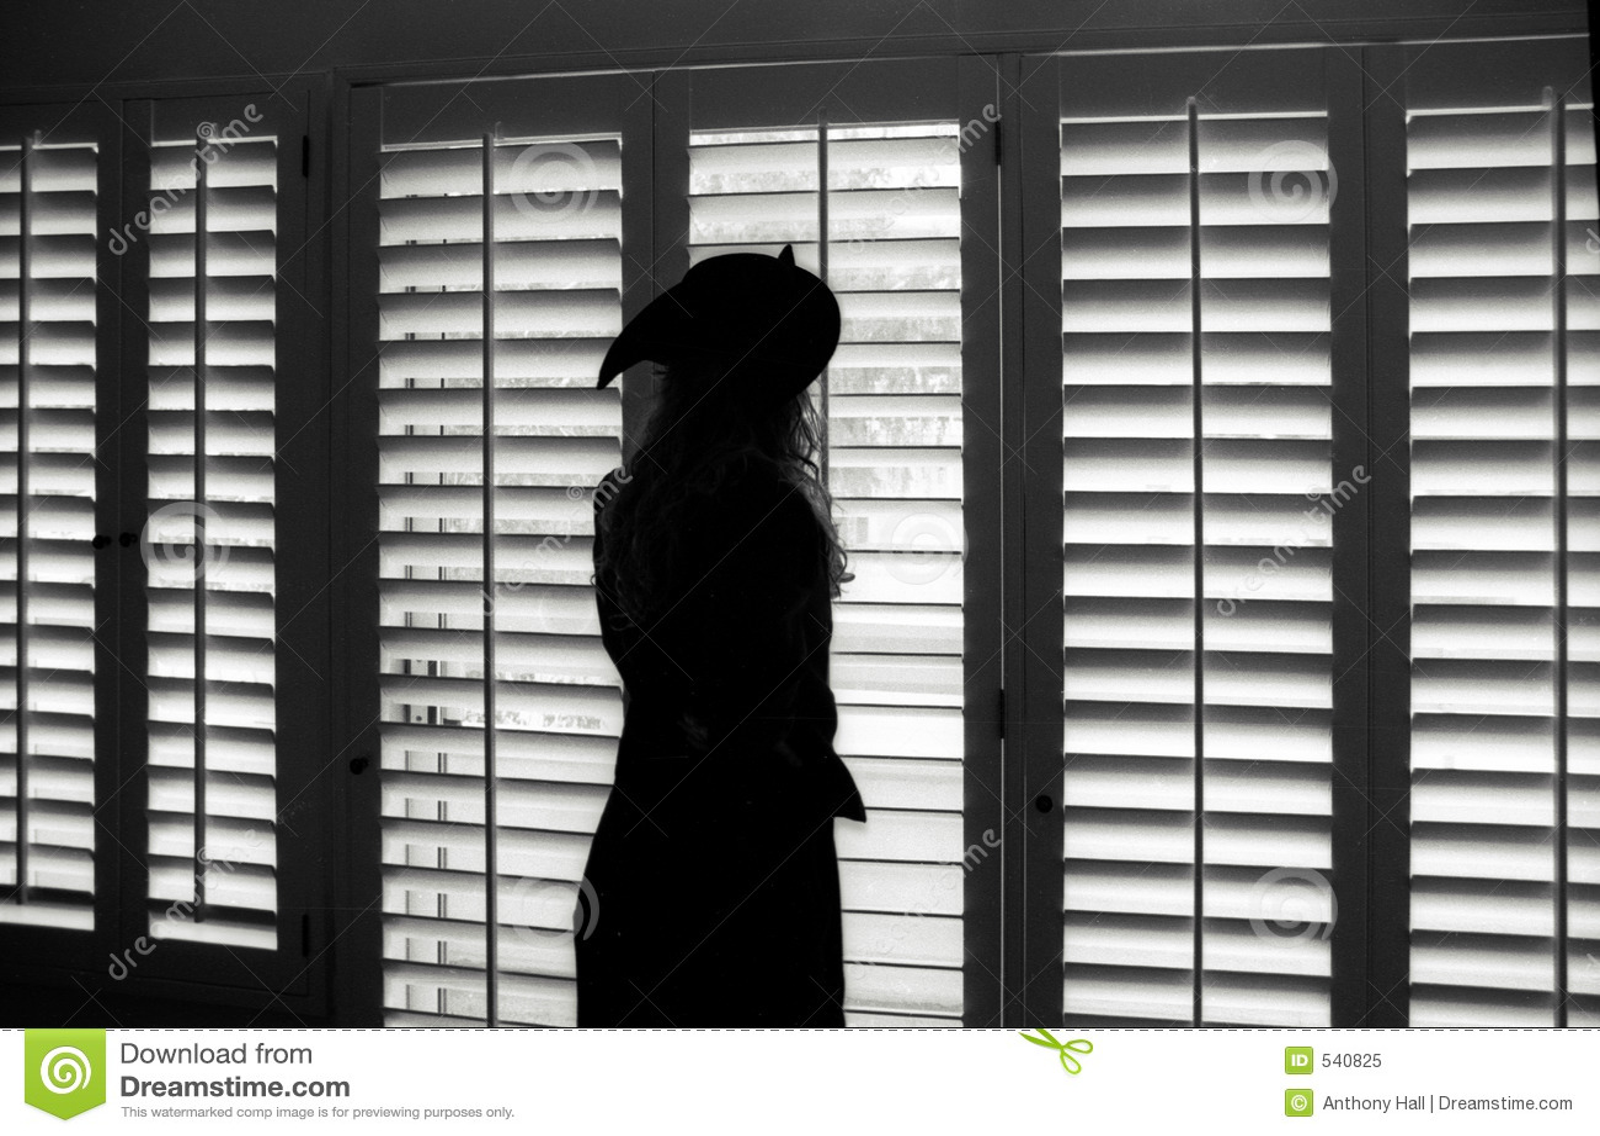 Download 新月形女孩帽子 库存图片. 图片 包括有 偷看, 里面, malibu, 女英雄, 沉思, 安赫莱斯, 预期 - 540825